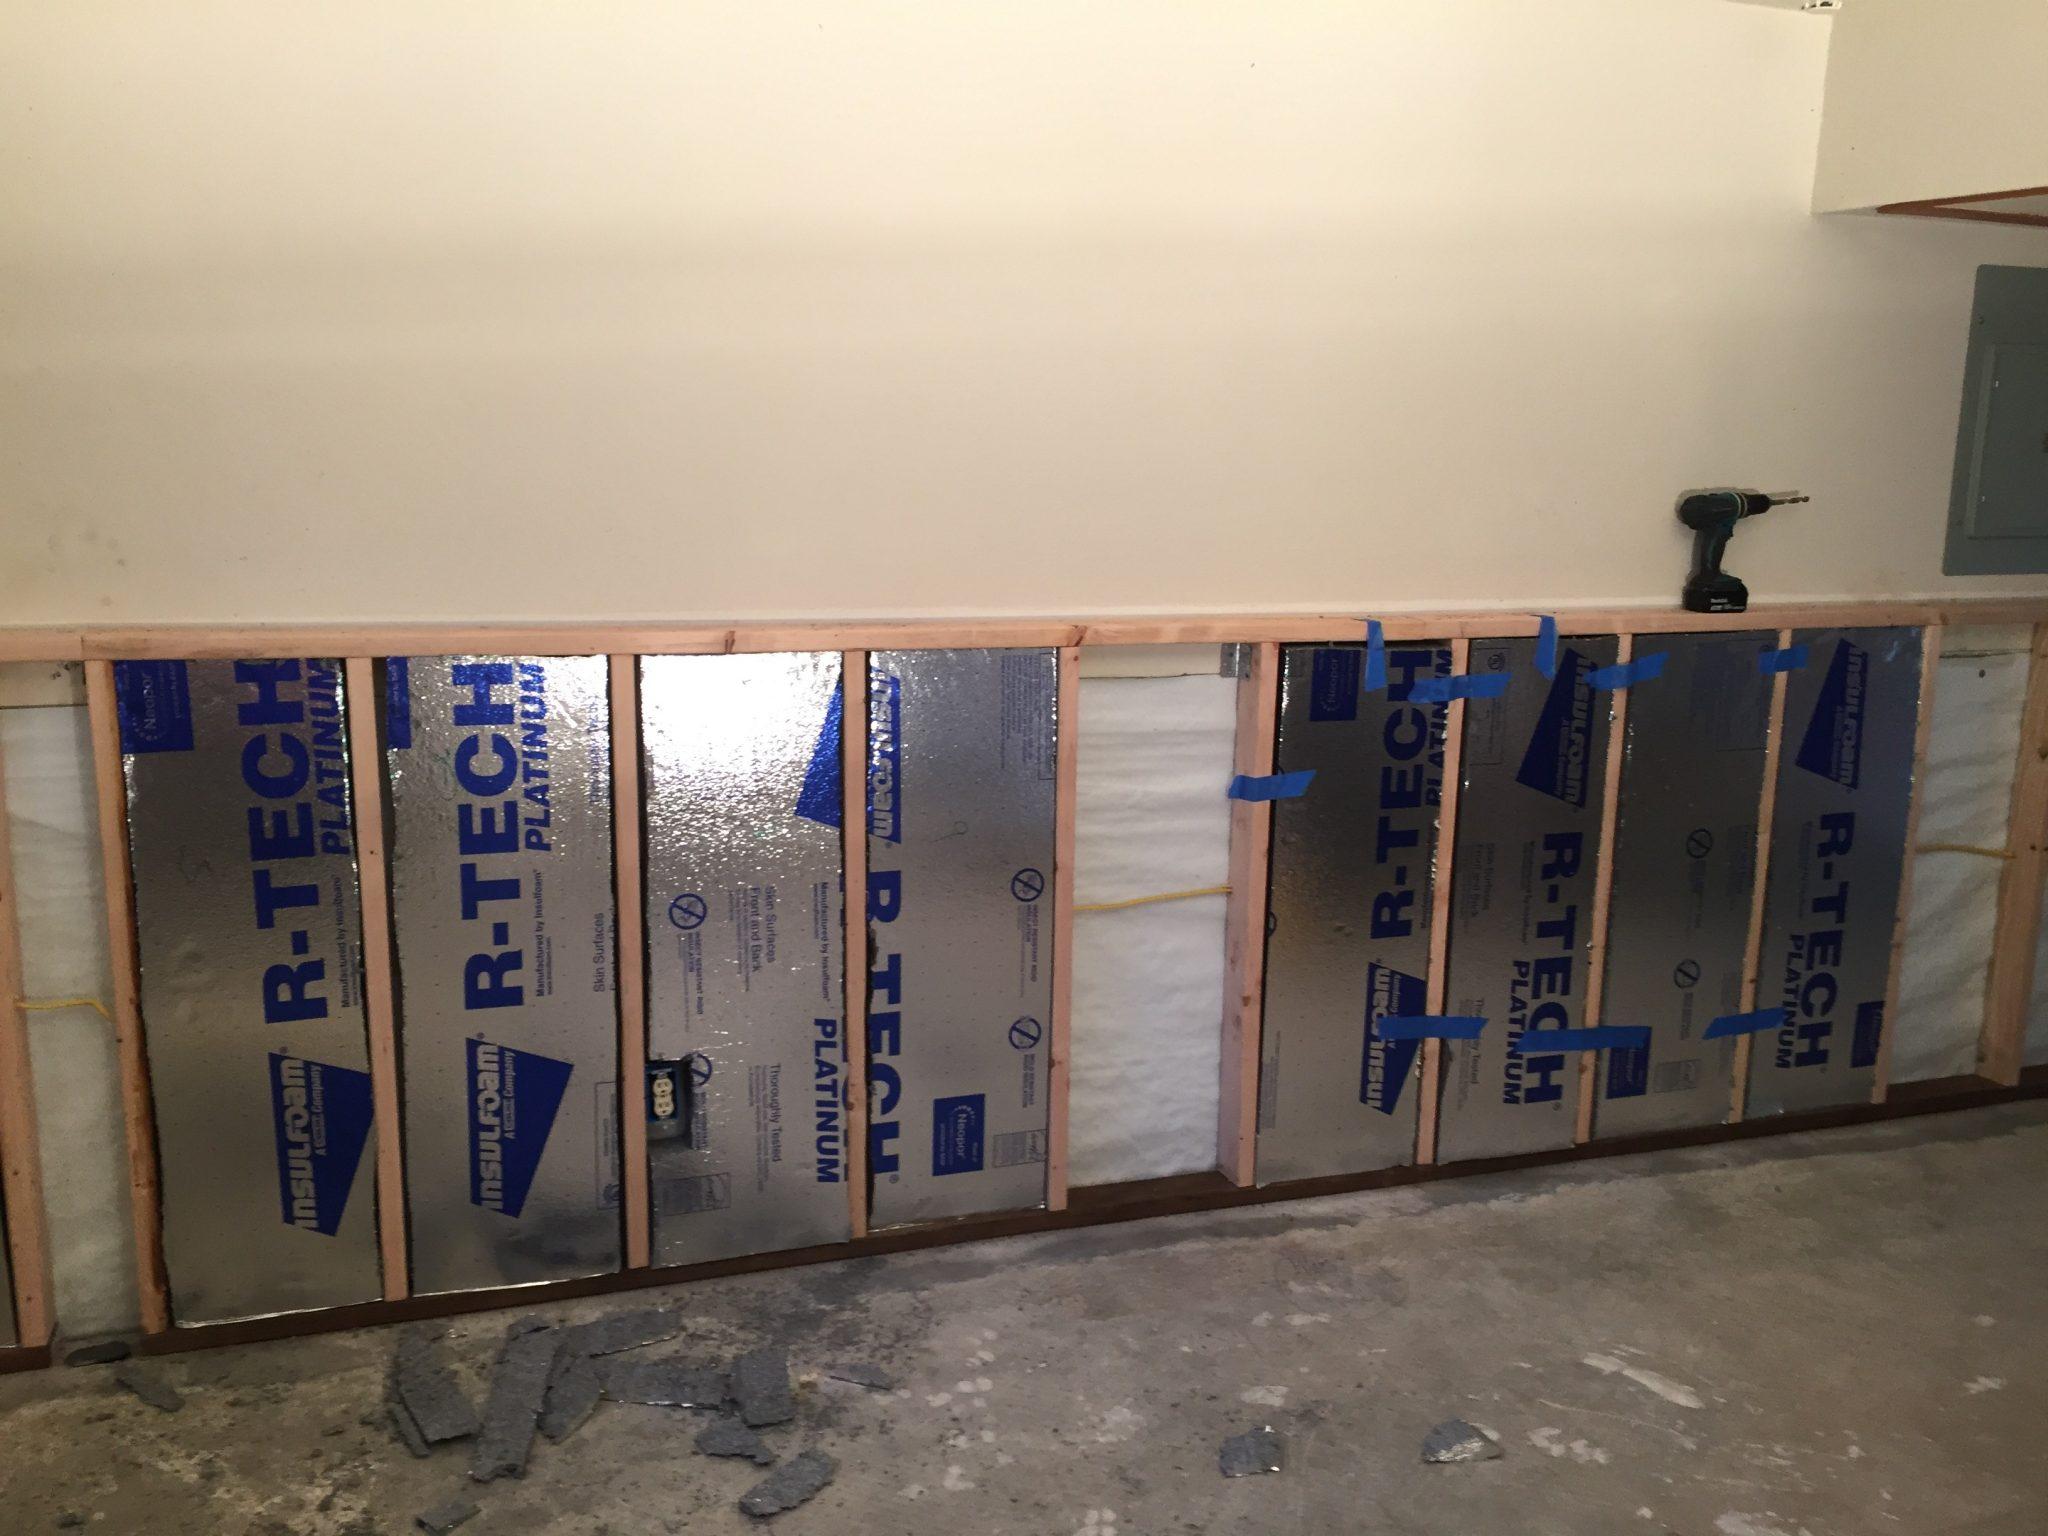 DIY Project Basement insulation upgrade after flood